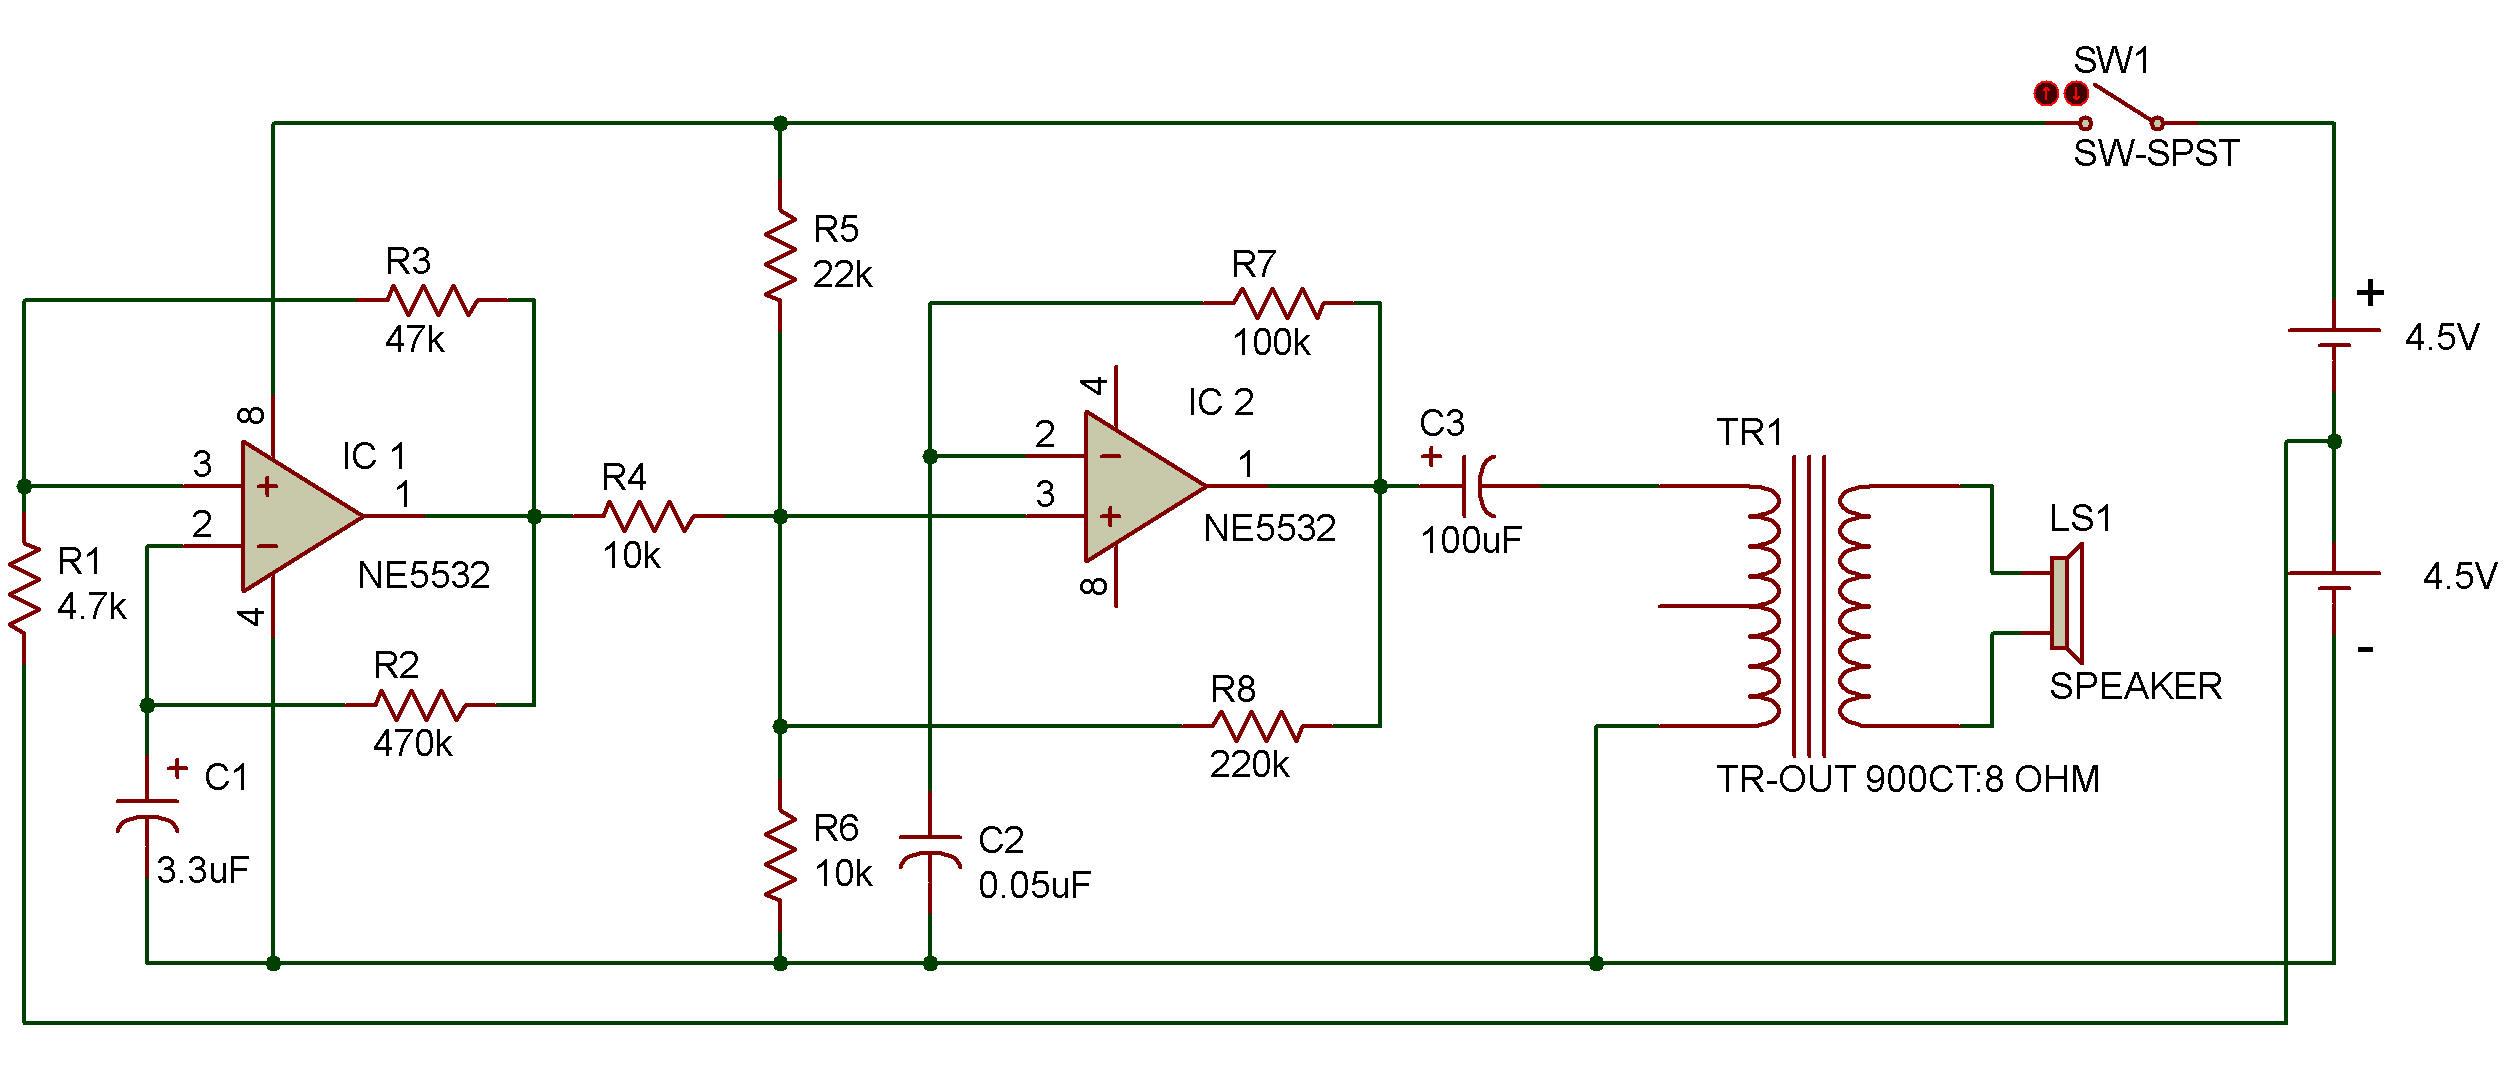 Oscillator Emergency Maristesdanslevar 60 Hz Clock Pulse Generator Circuit Diagram Tradeoficcom The Sirens We Built In Three Previous Projects Hand Operated Sweep